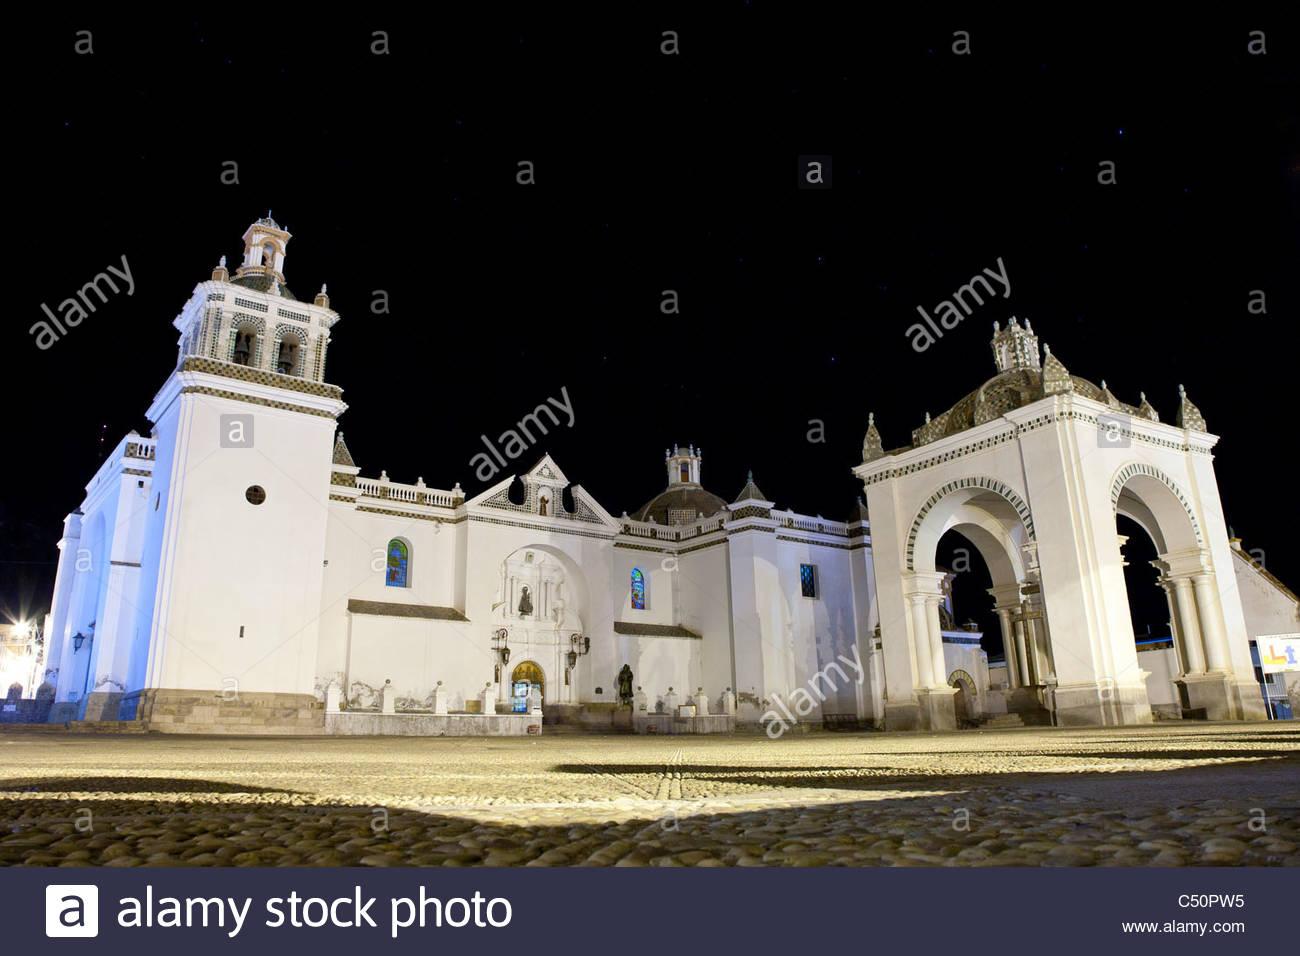 Basilica of Our Lady of Copacabana Cathedral at night, Copacabana, La Paz Department, Bolivia Stock Photo